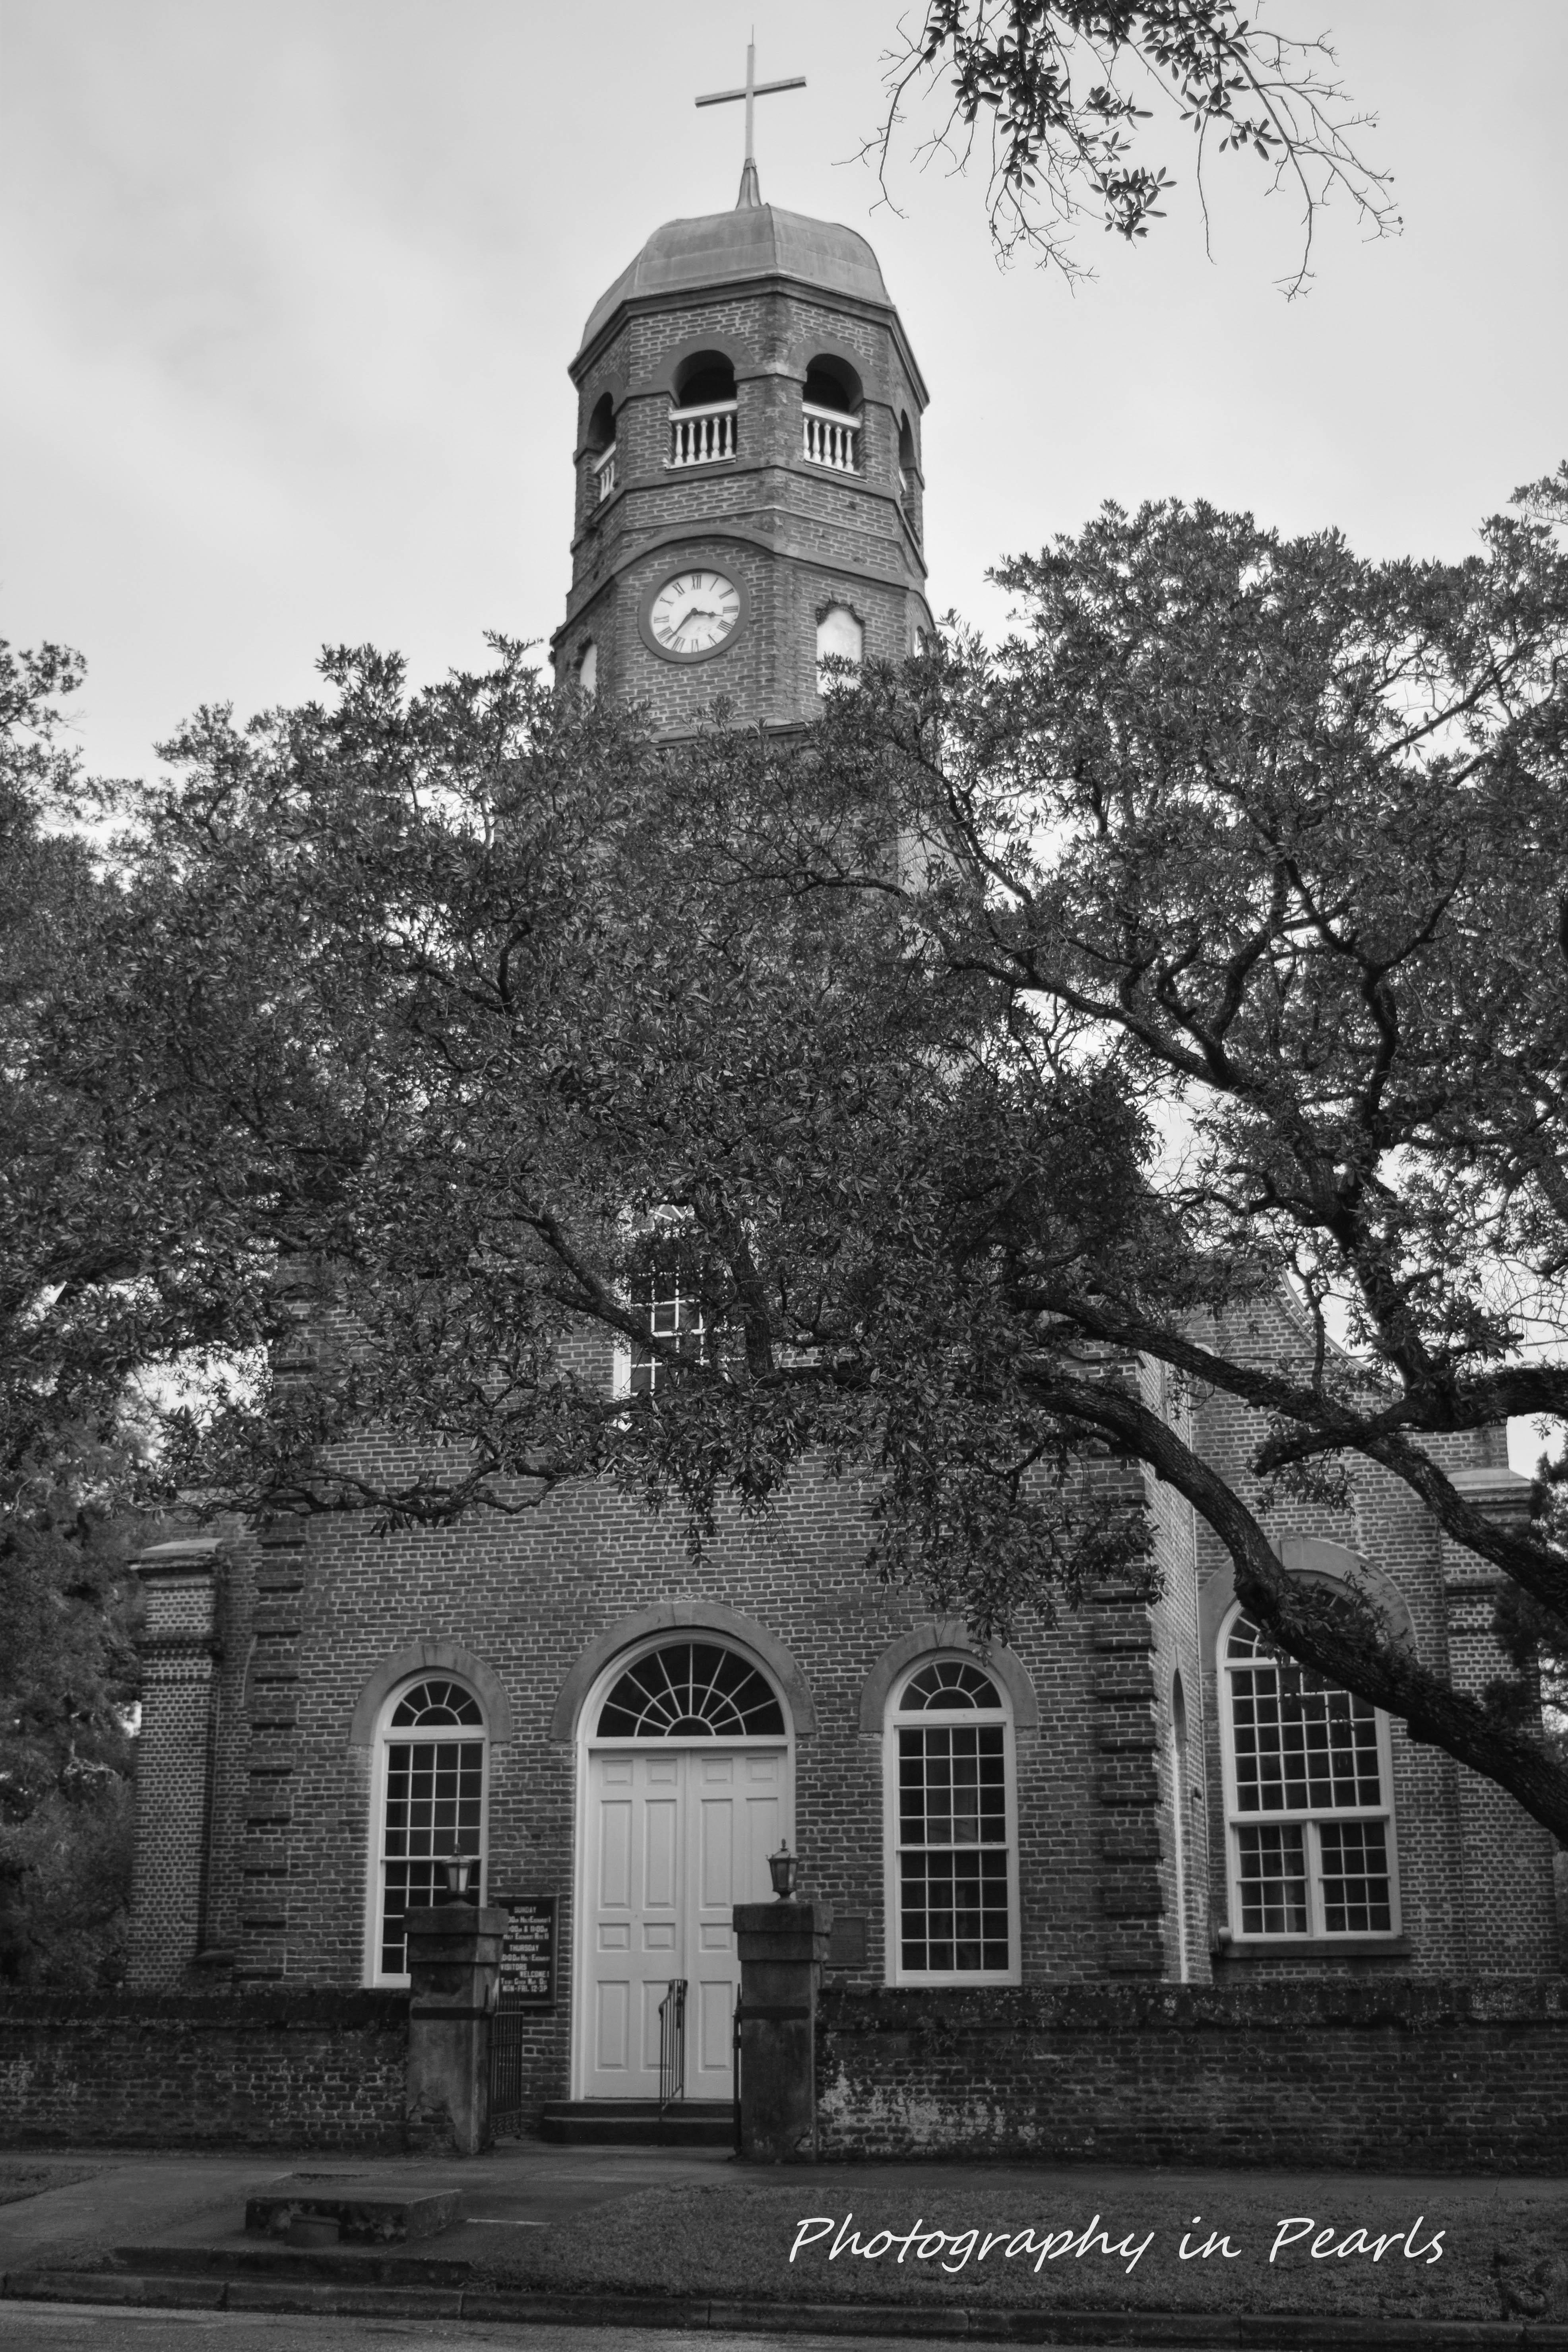 Prince George Episcopal Church 1721